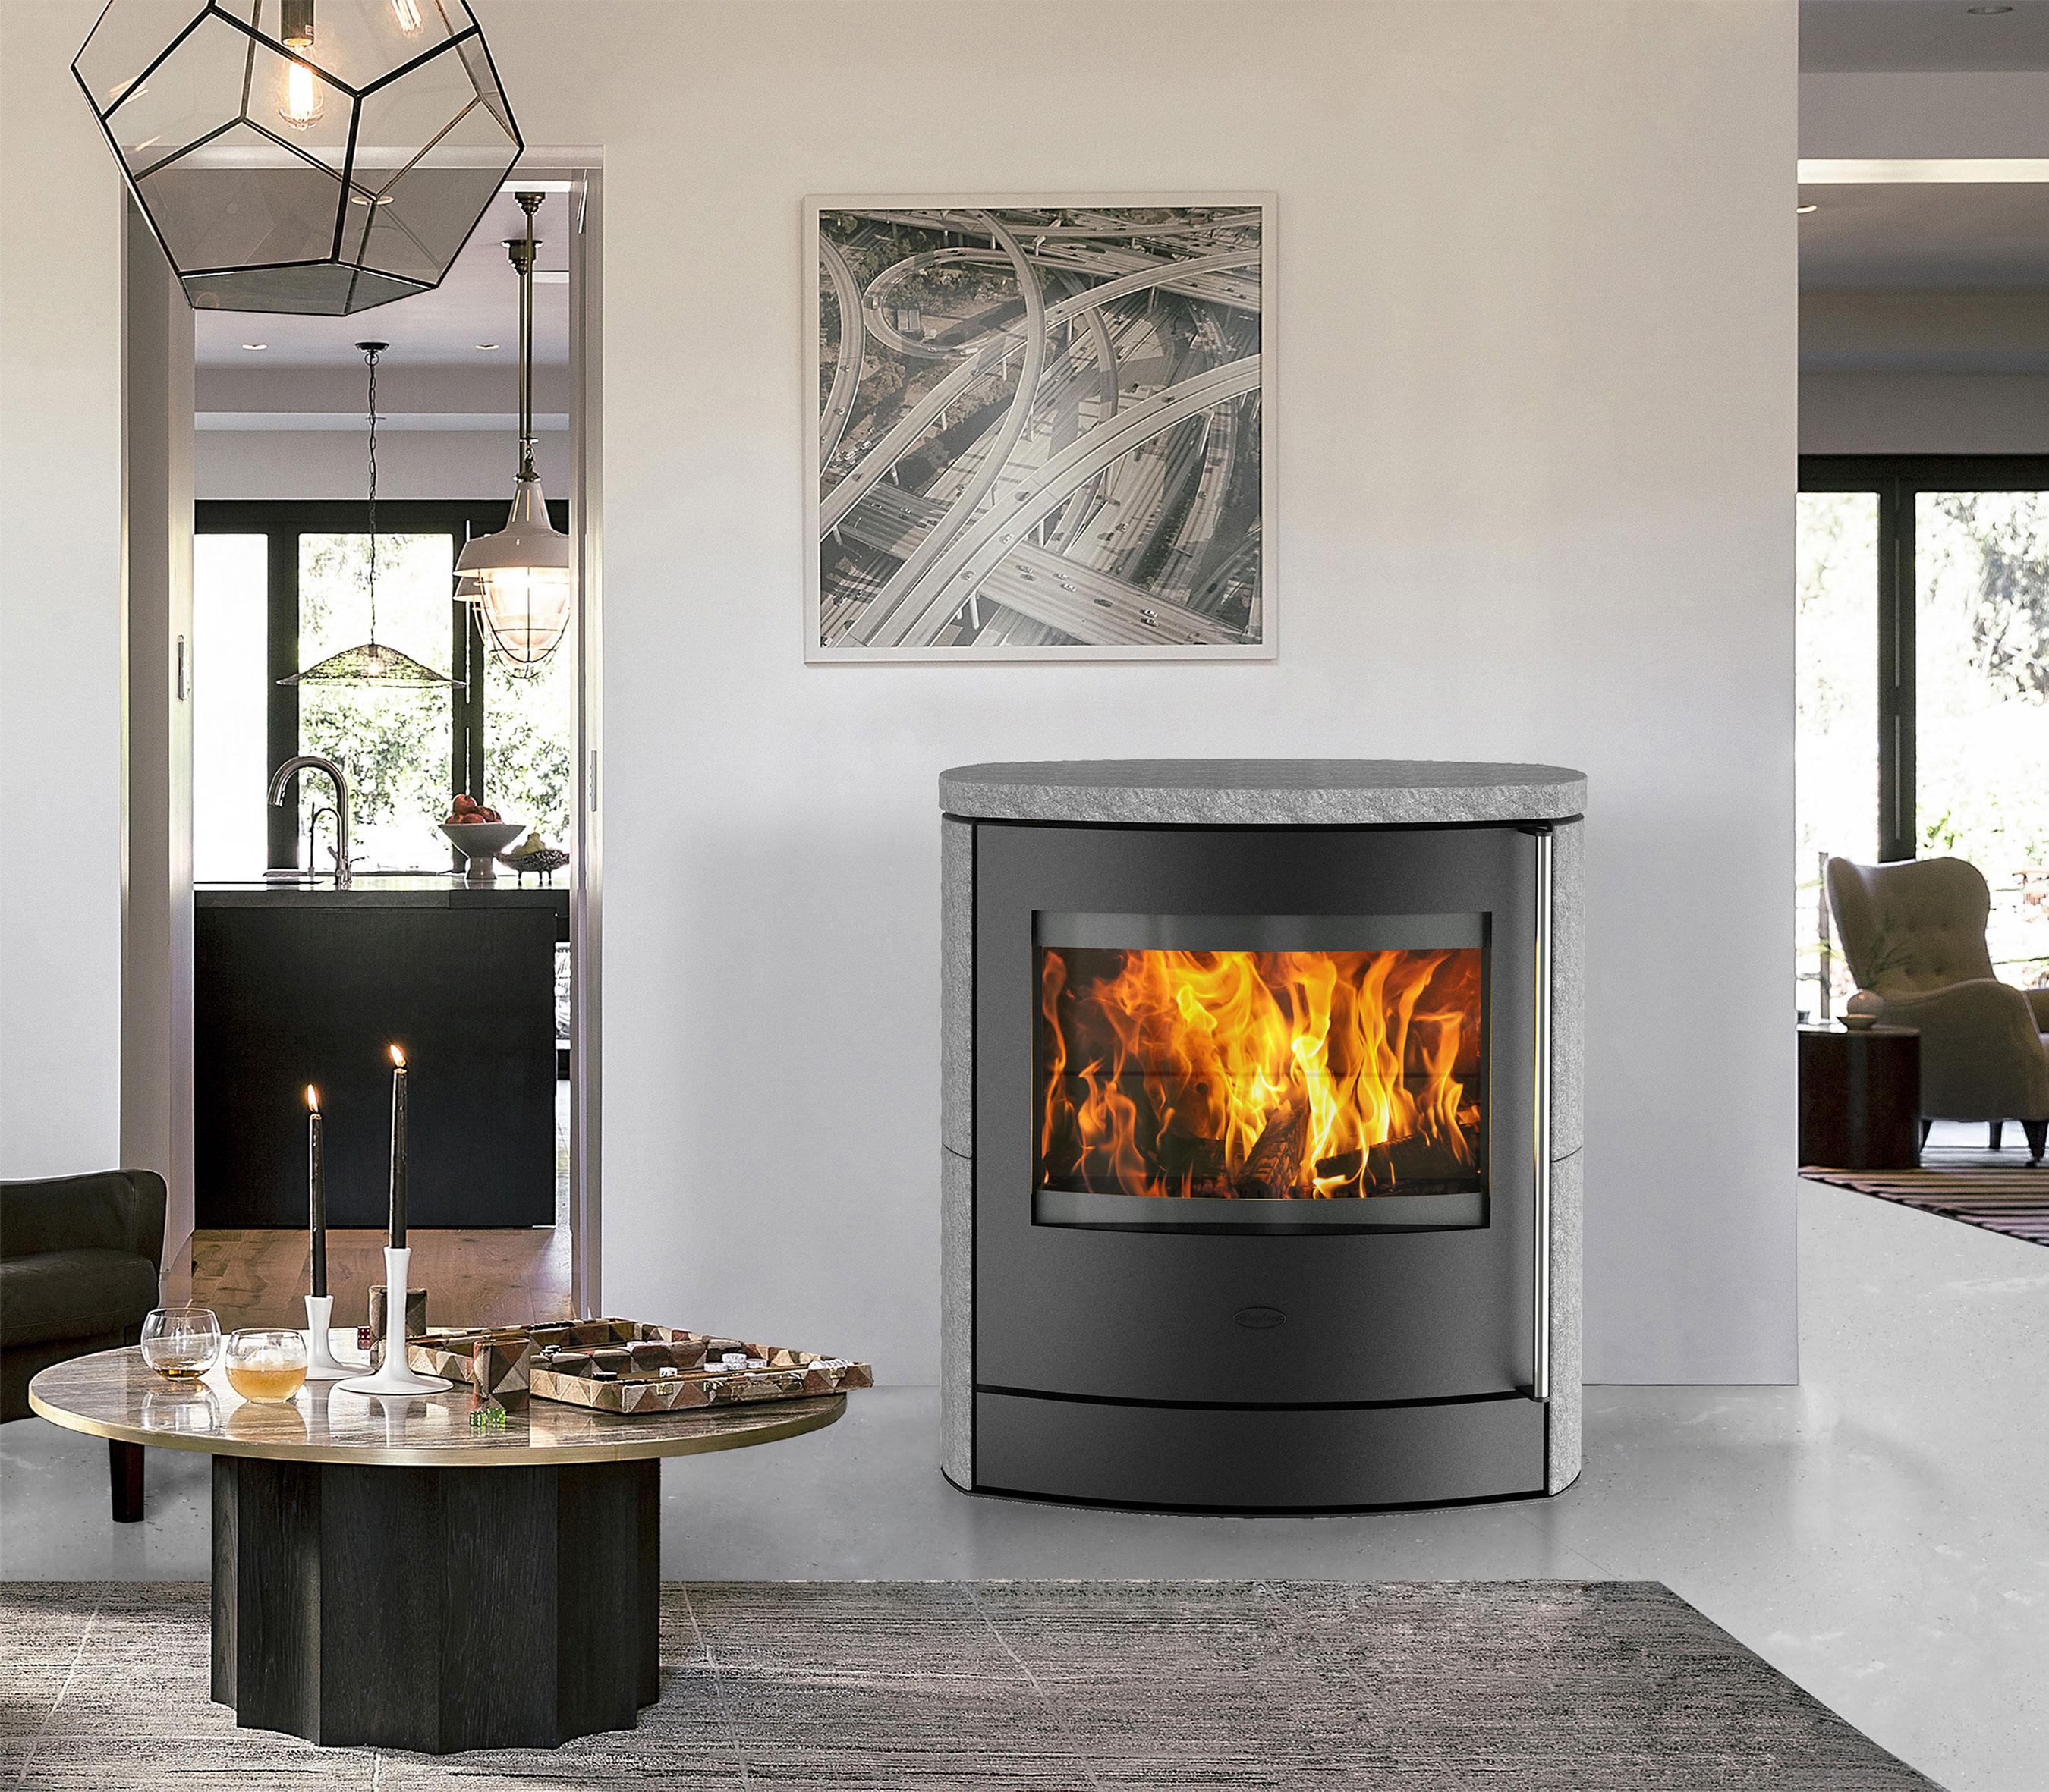 Kaminofen Fireplace Adamis raumluftunabhängig Speckstein 7kW Bild 4